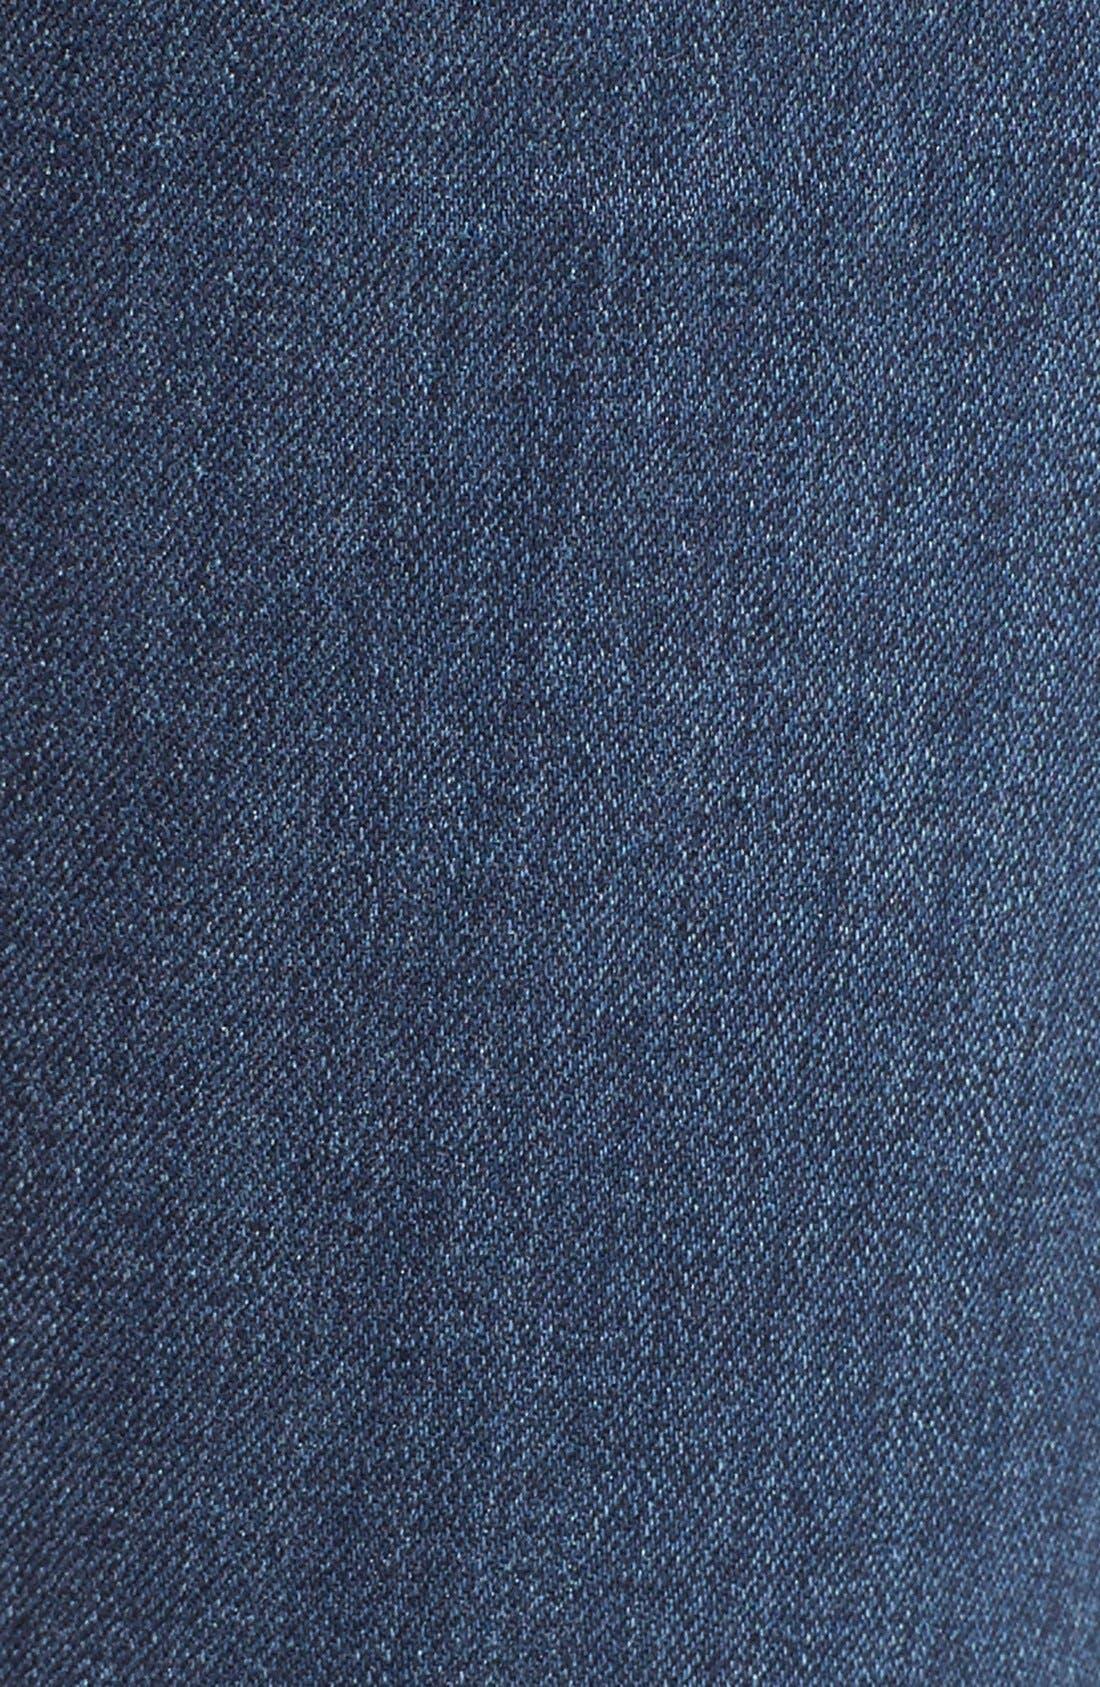 Alternate Image 5  - Hudson Jeans 'Collin' Skinny Jeans (Anchor Light)